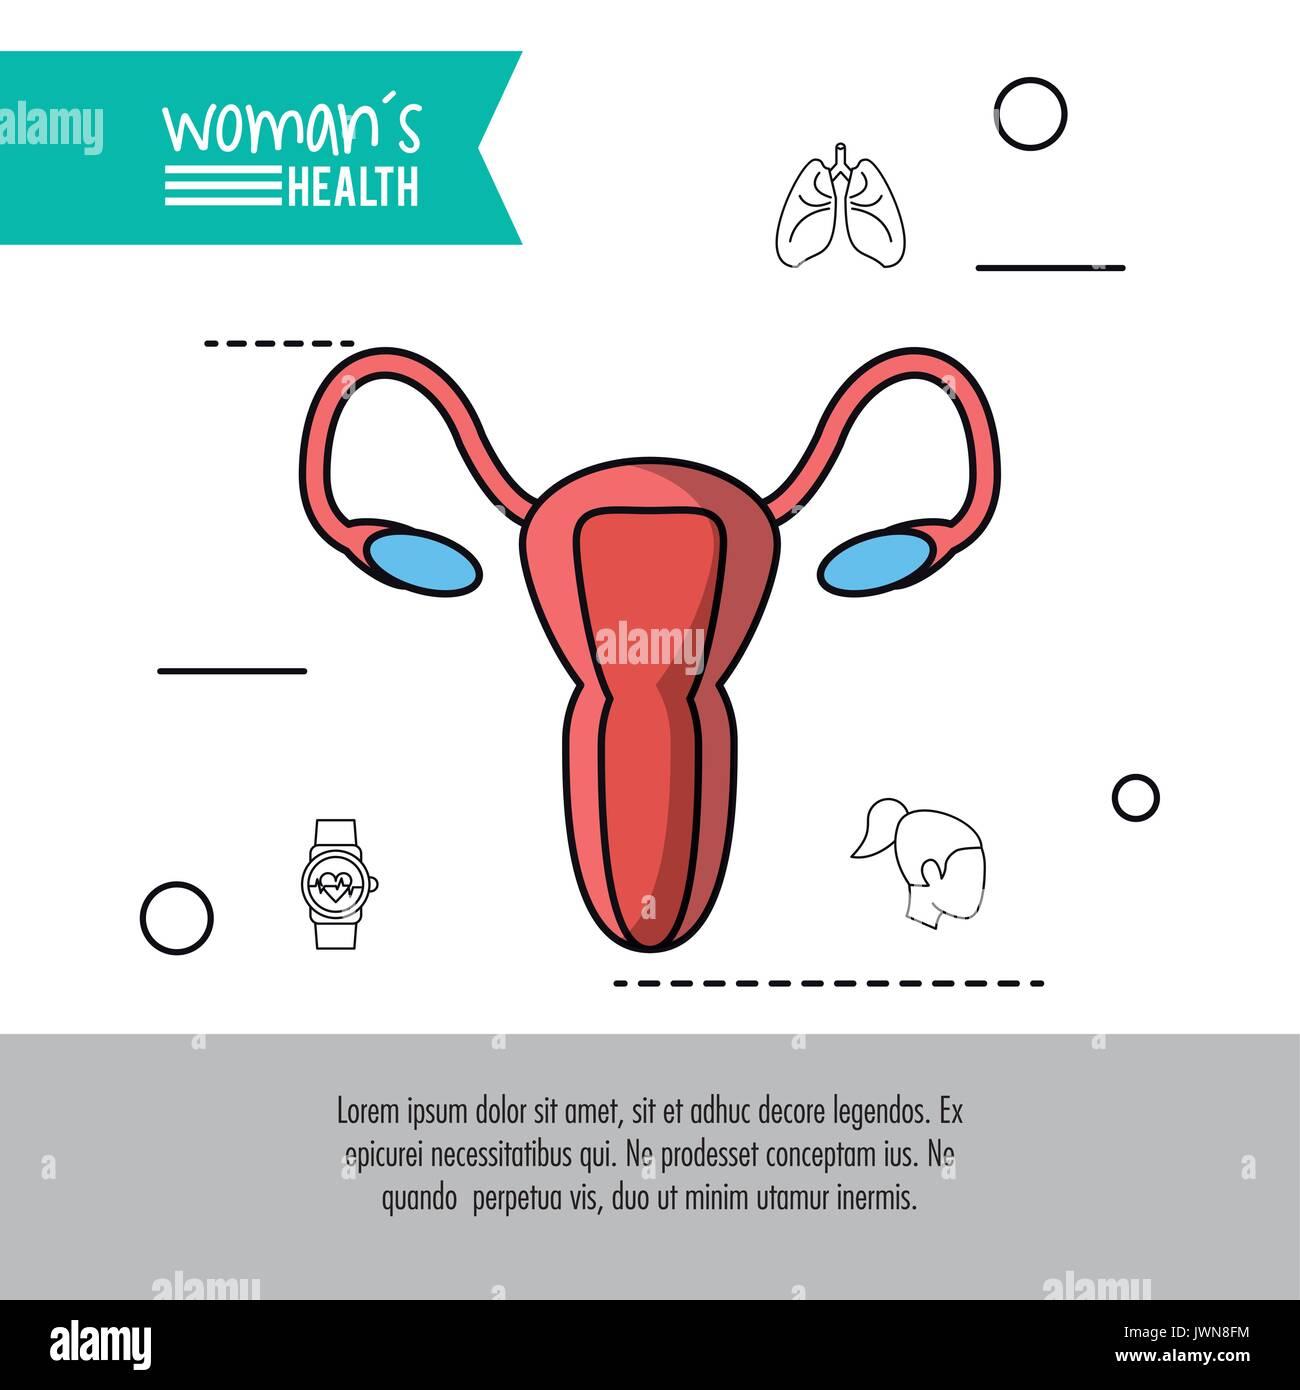 Human Reproductive System Stockfotos & Human Reproductive System ...